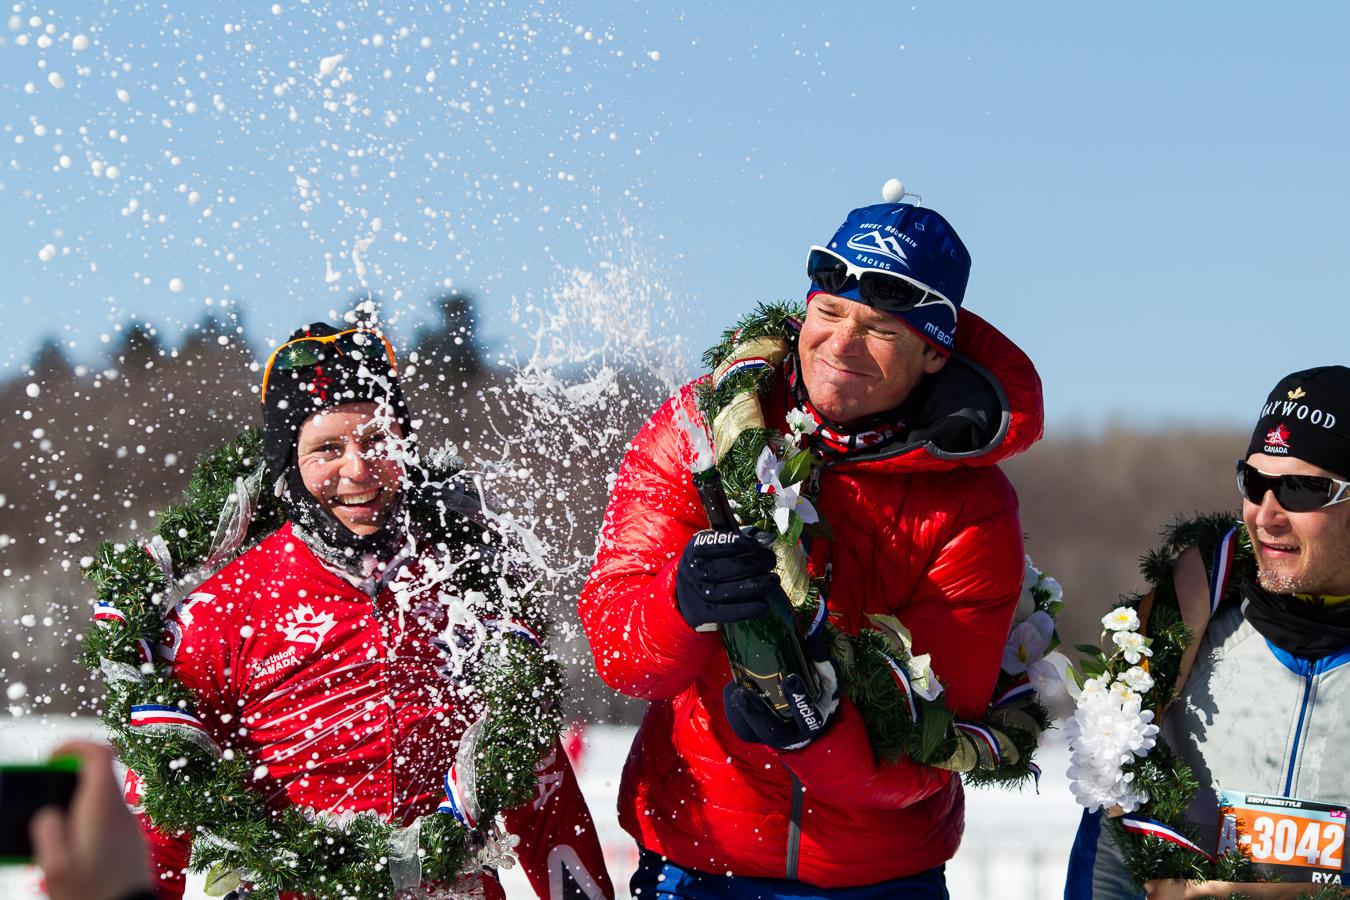 Les gagnants du 51km Patin, Ian Murray, Jonathan Tremblay et Ryan Atkins, célèbrent leur victoire. Gatineau Loppet 2013, Gatineau (© Sébastien Lavallée)